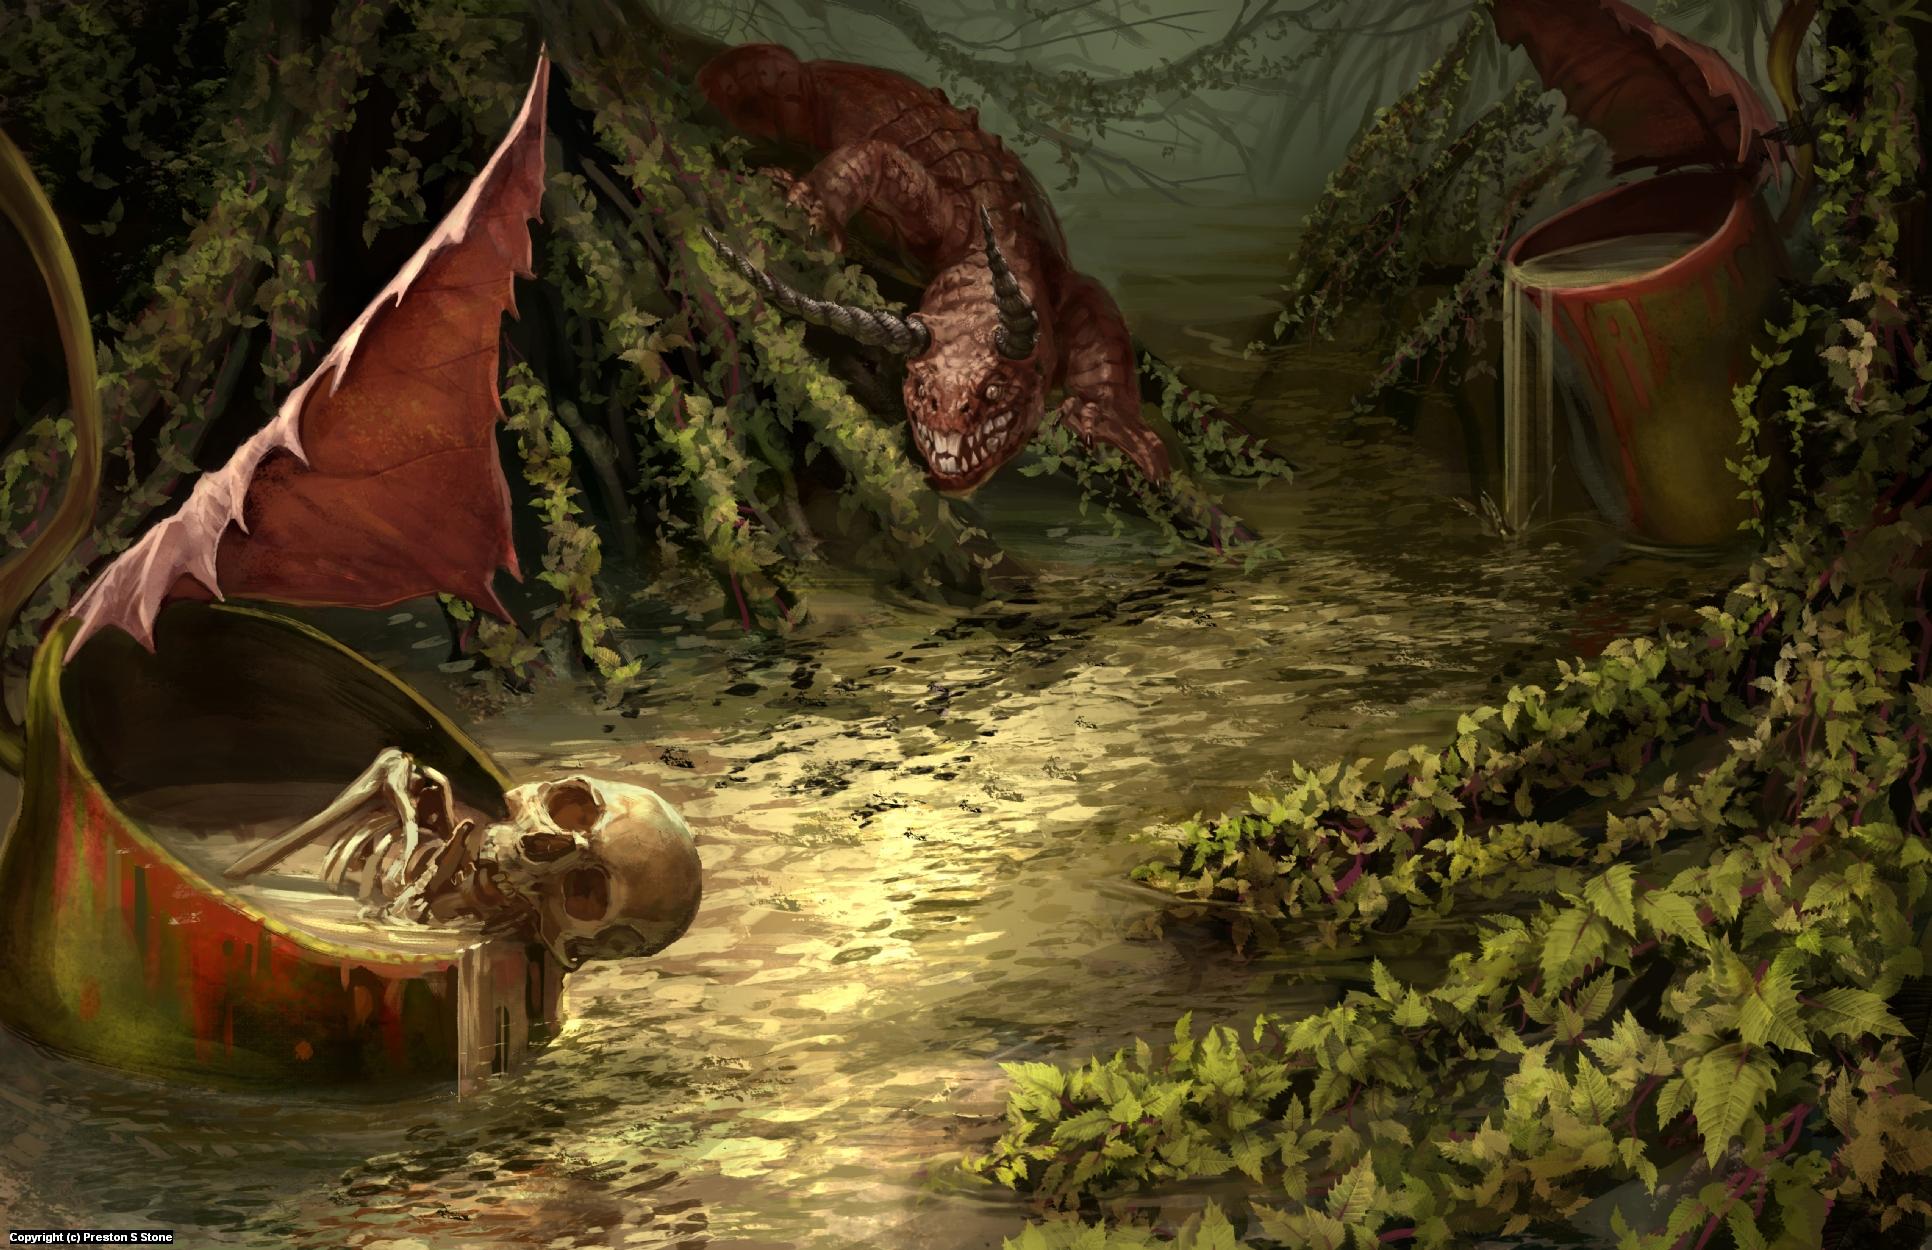 Diabolic Environment Artwork by Preston Stone